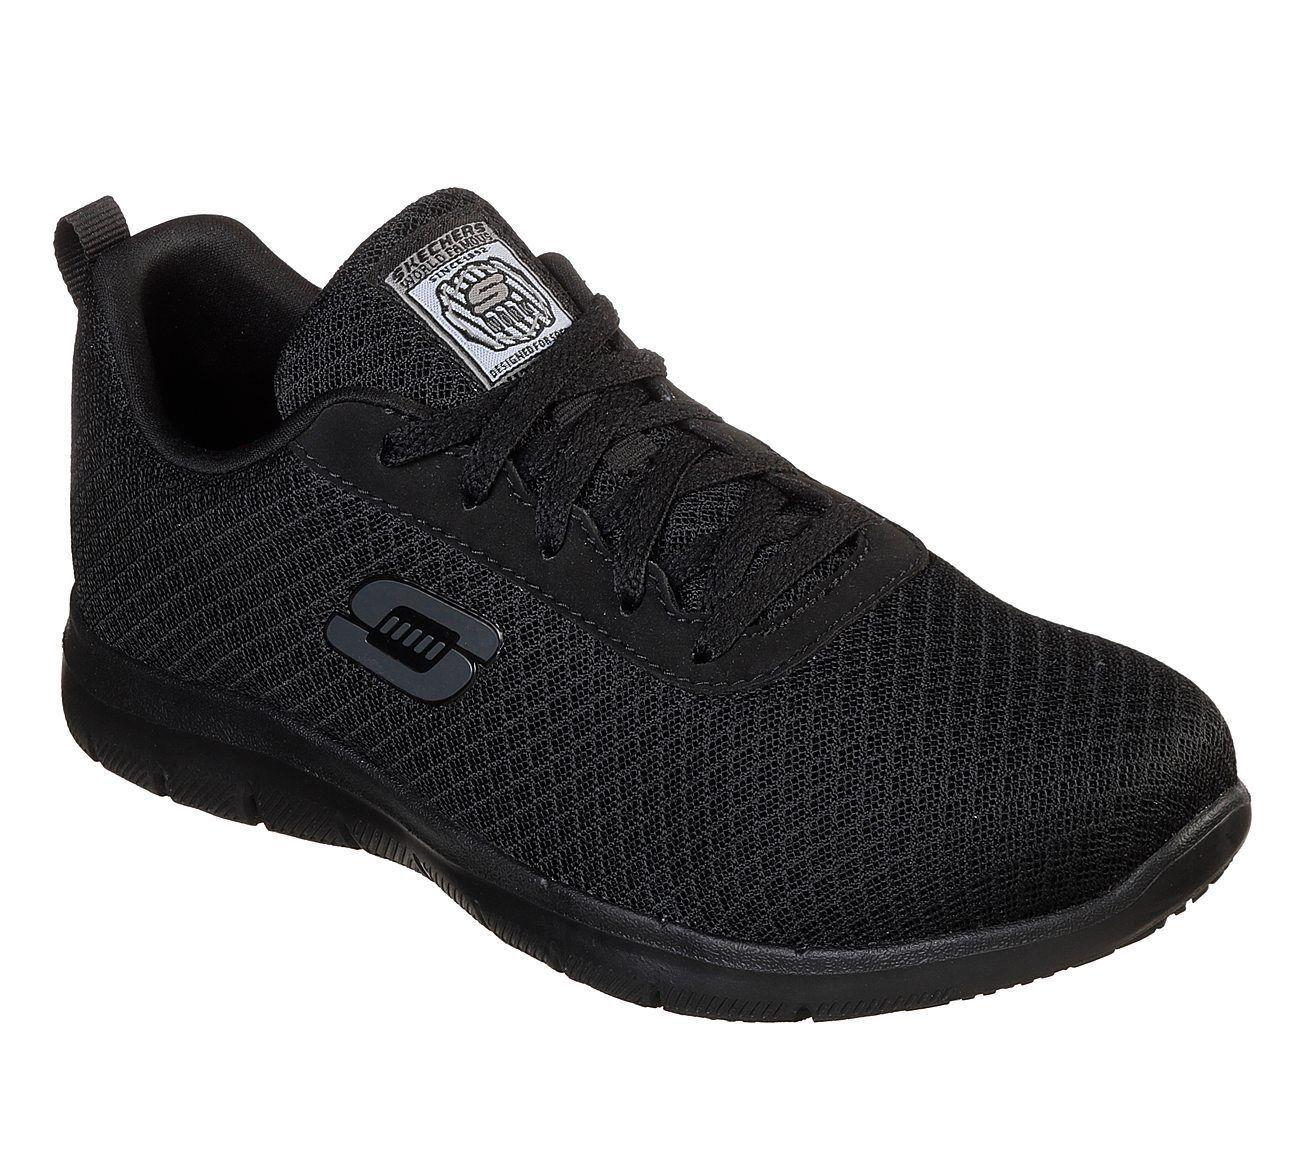 Black Skechers shoes Women Memory Work Resistant Safe Electrical Hazard EH